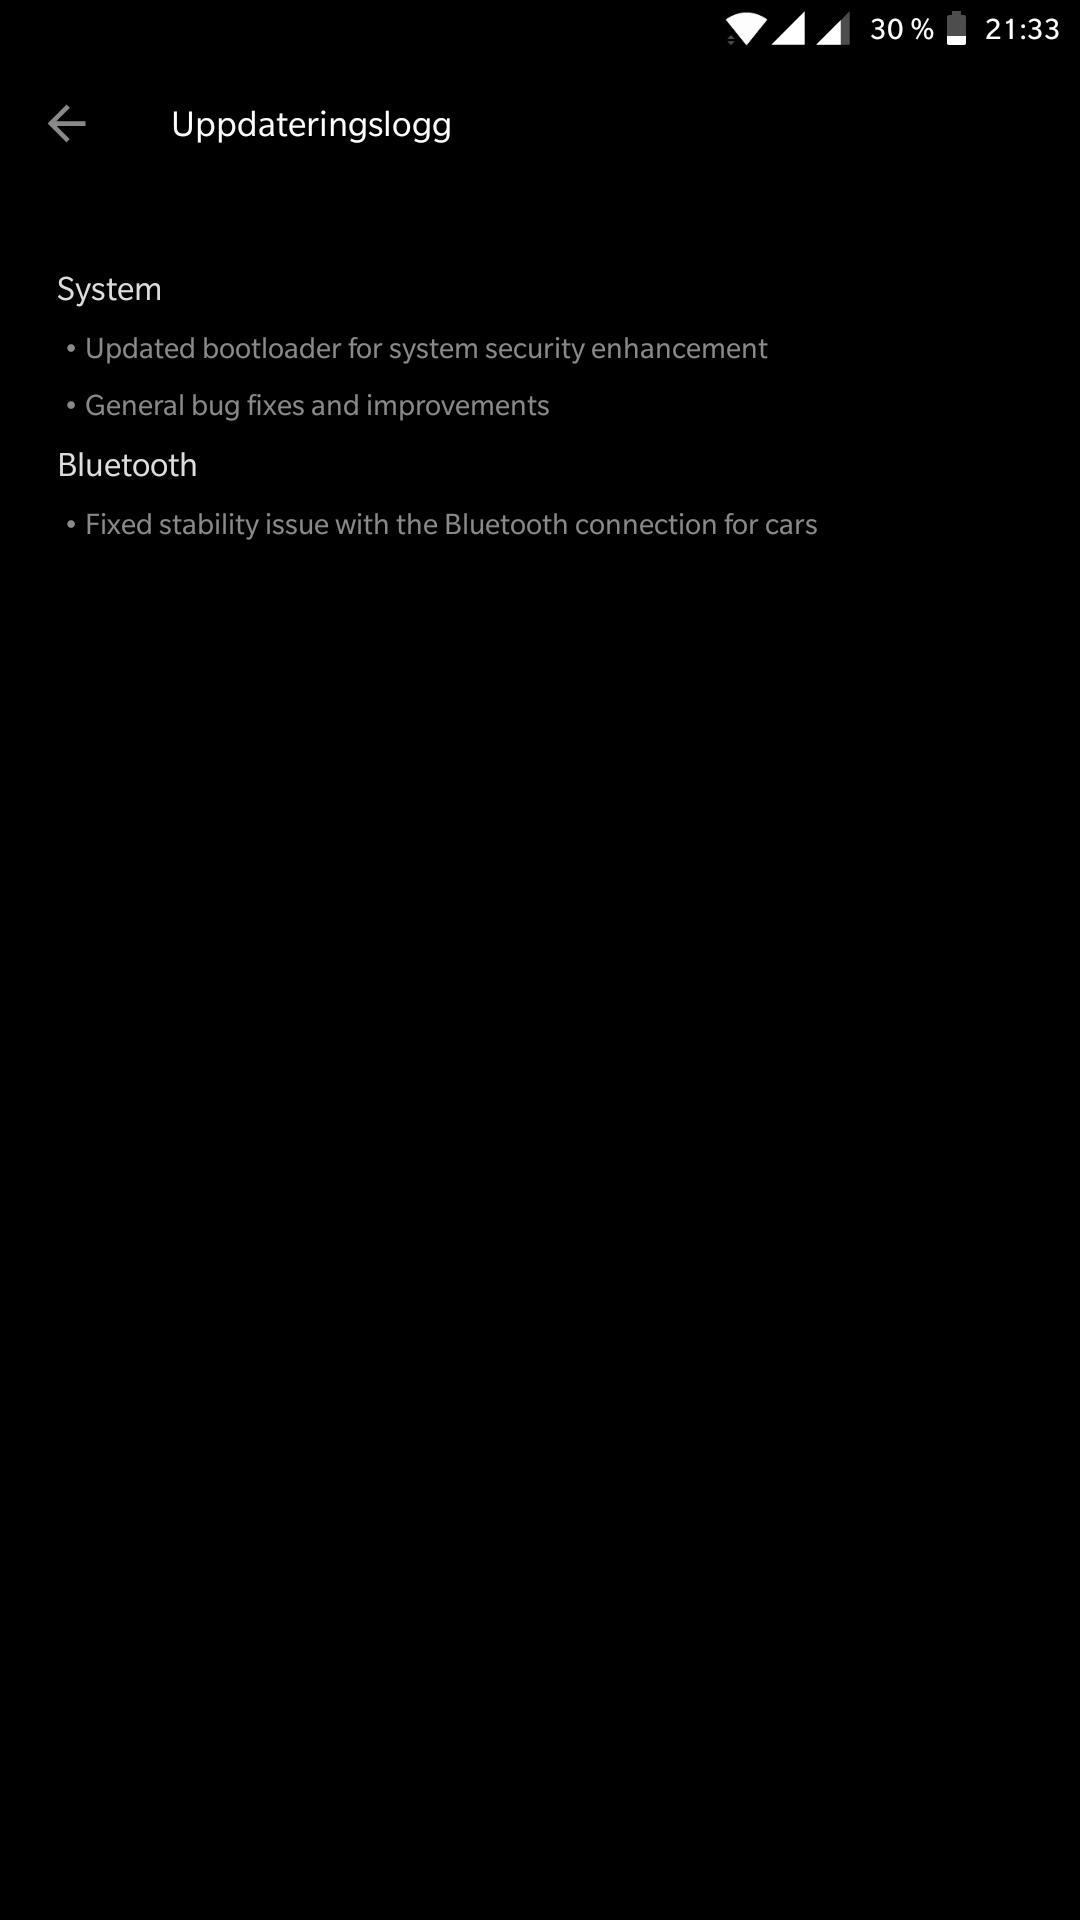 Screenshot (16 juni 2018 21_33_41).jpg